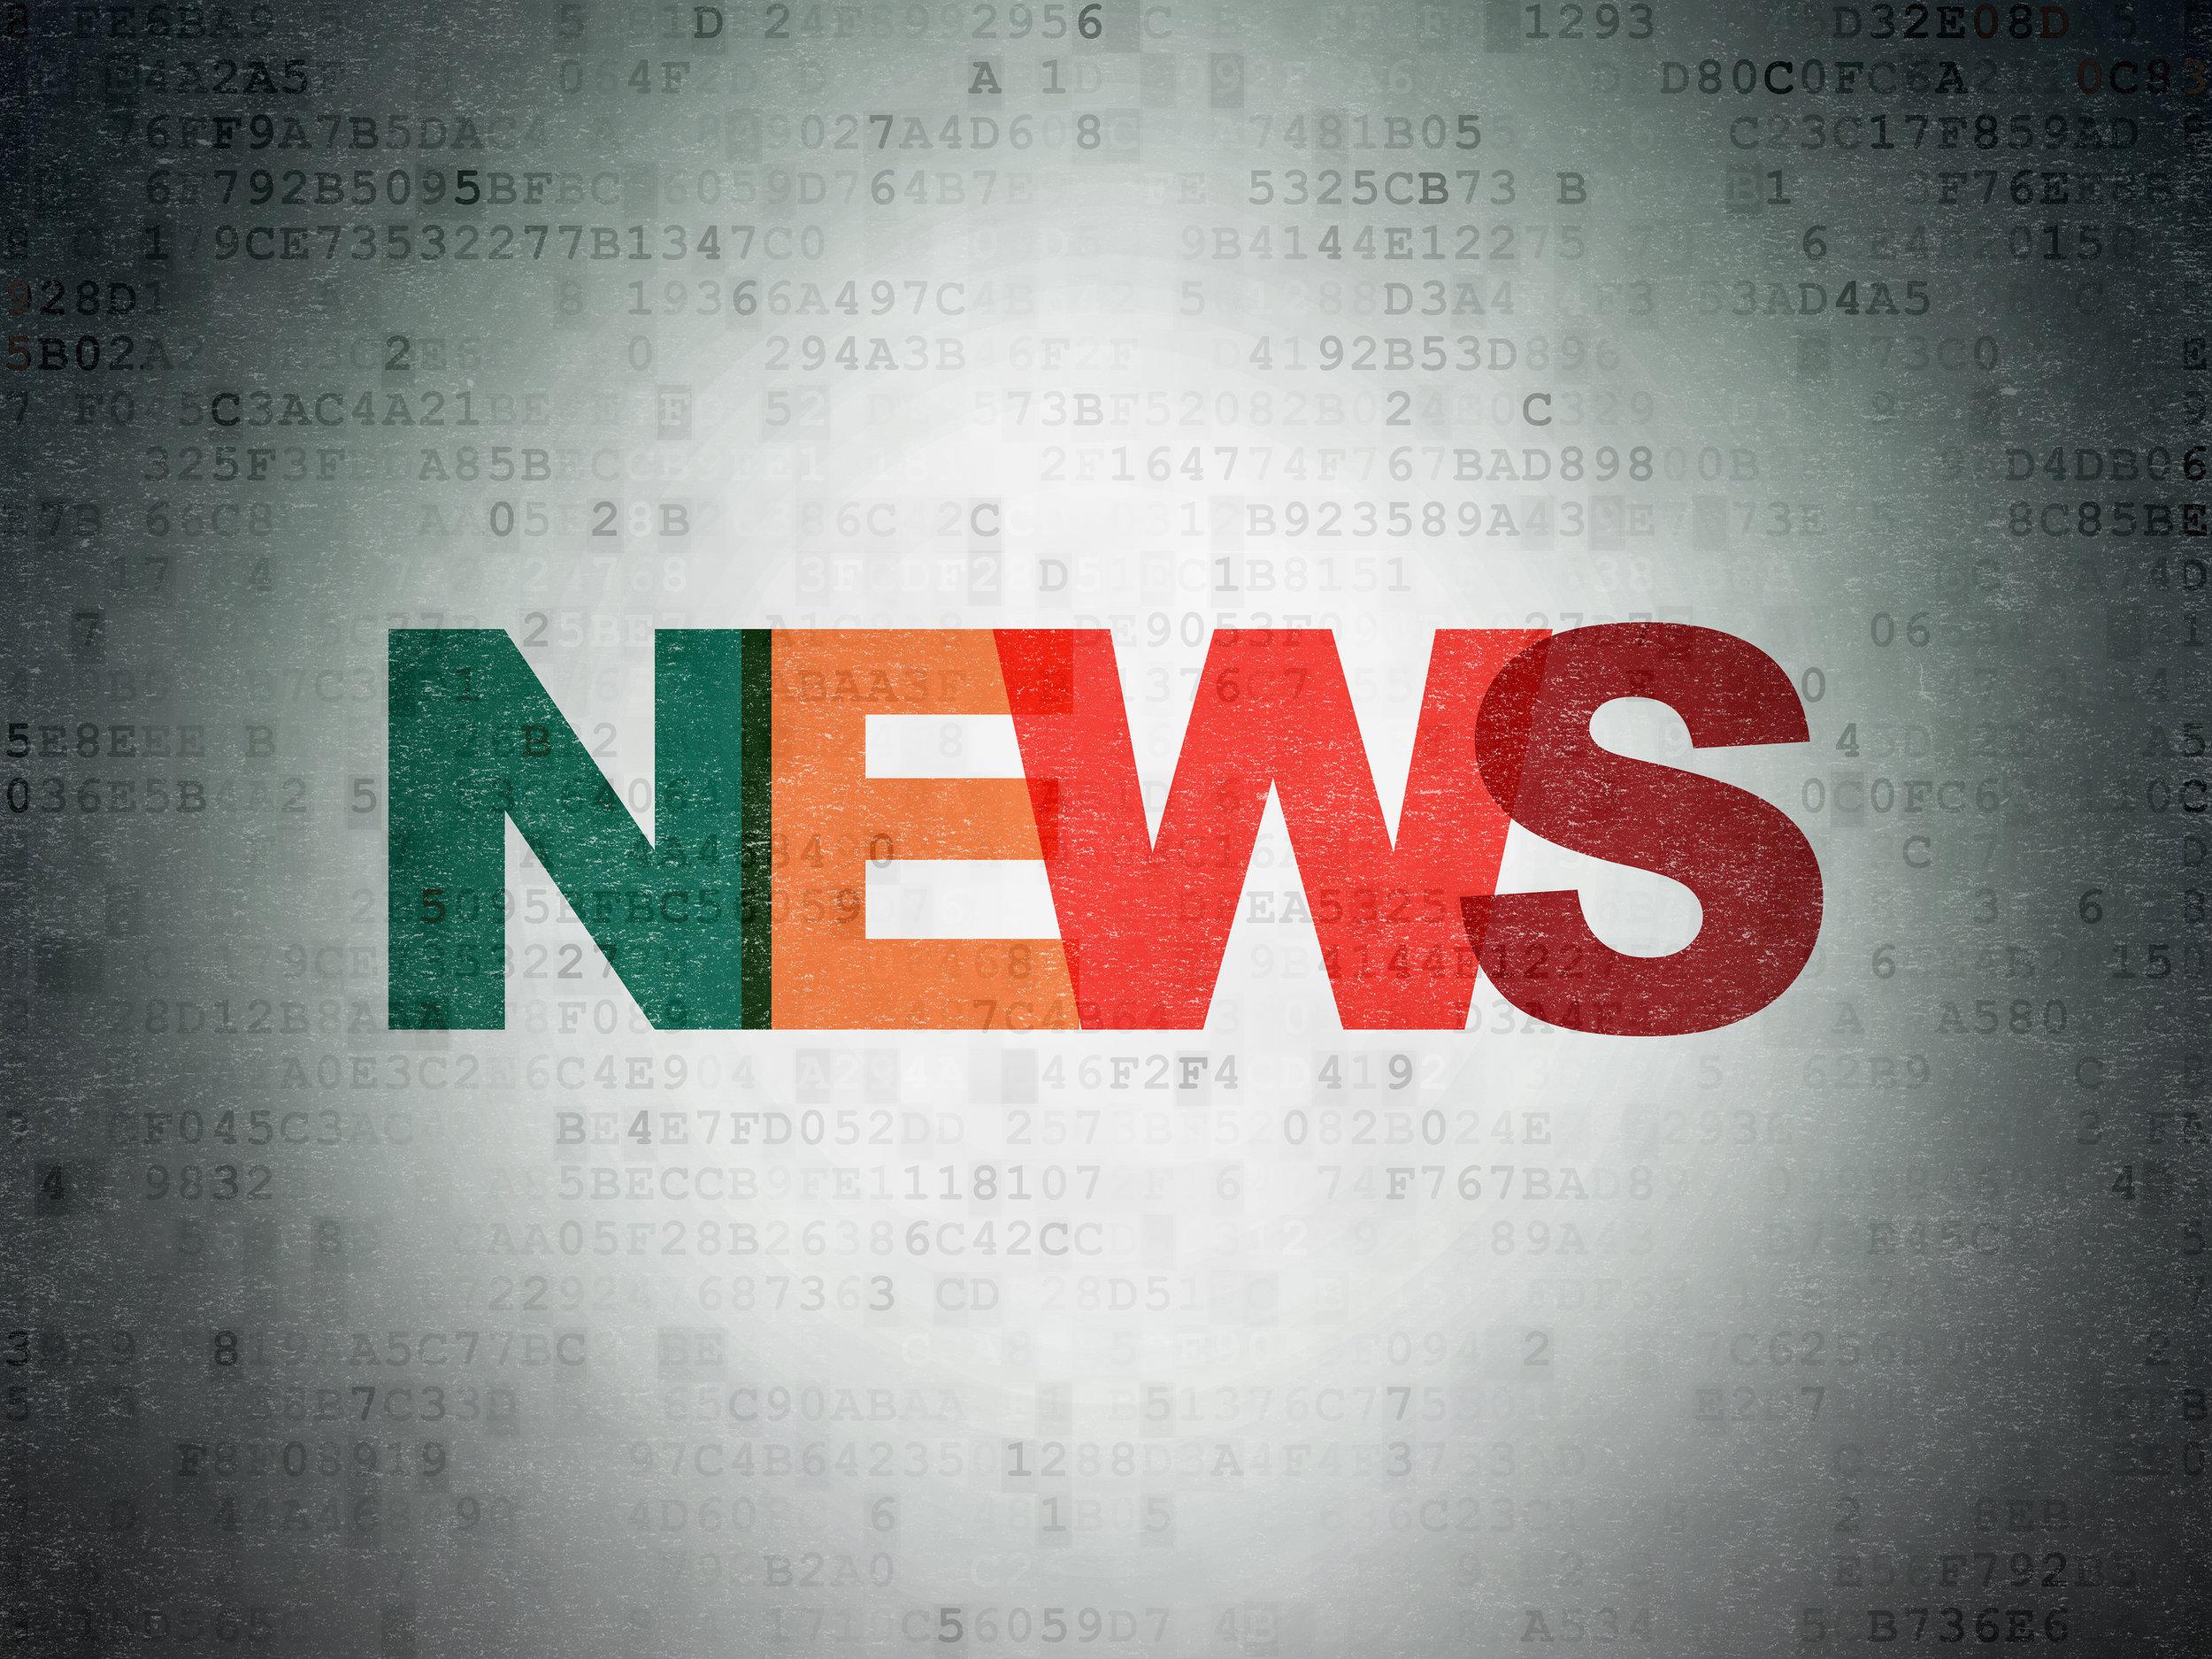 bigstock-News-concept-News-on-Digital--88819604.jpg